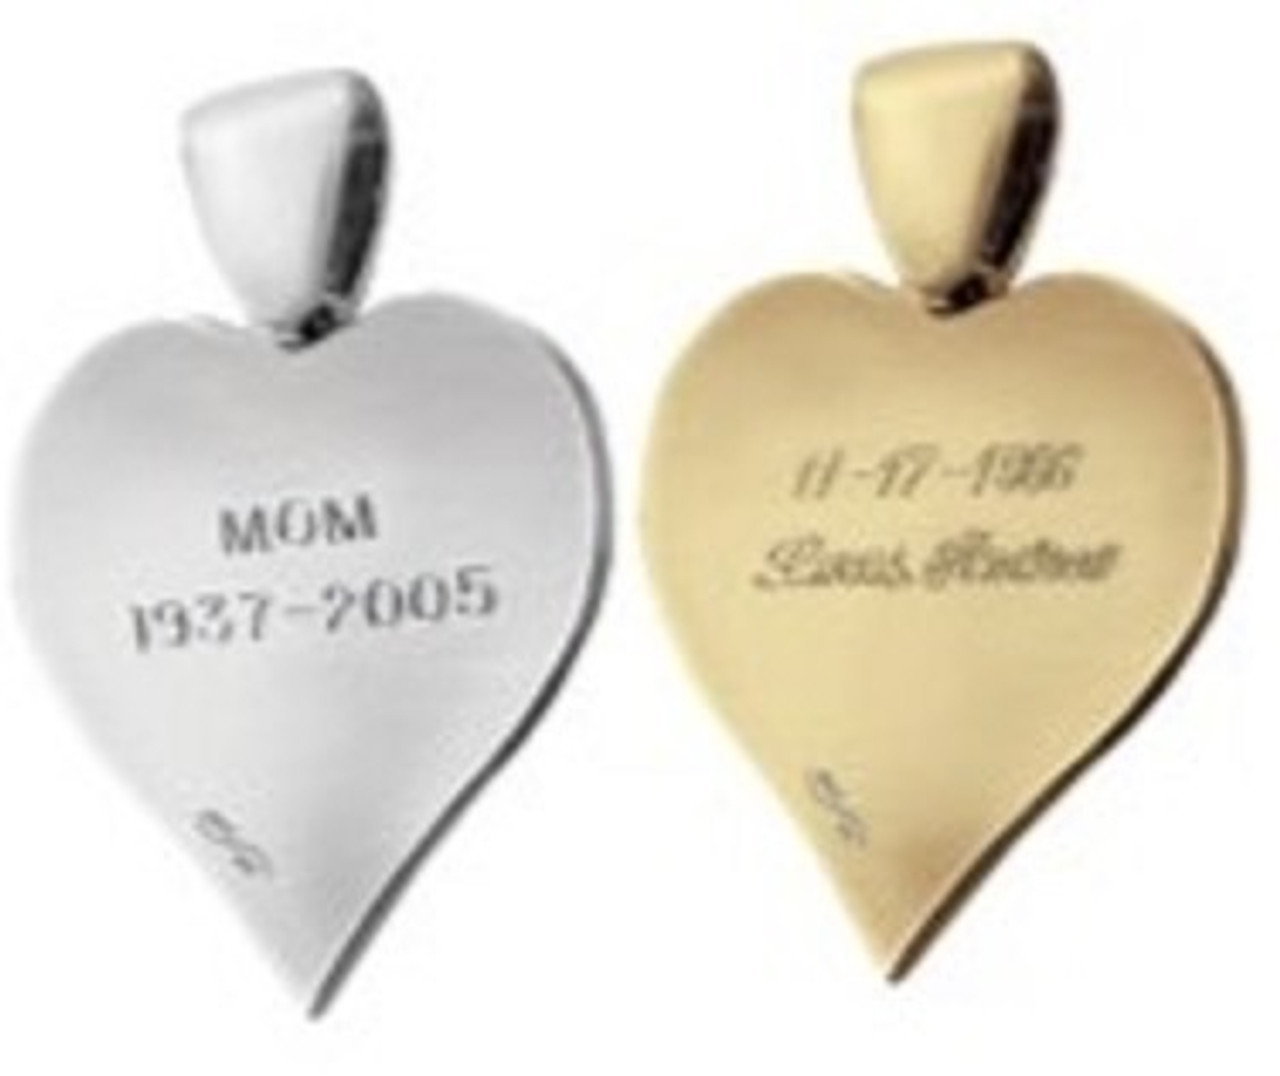 Single HeartFelt Charm with Back Engravings